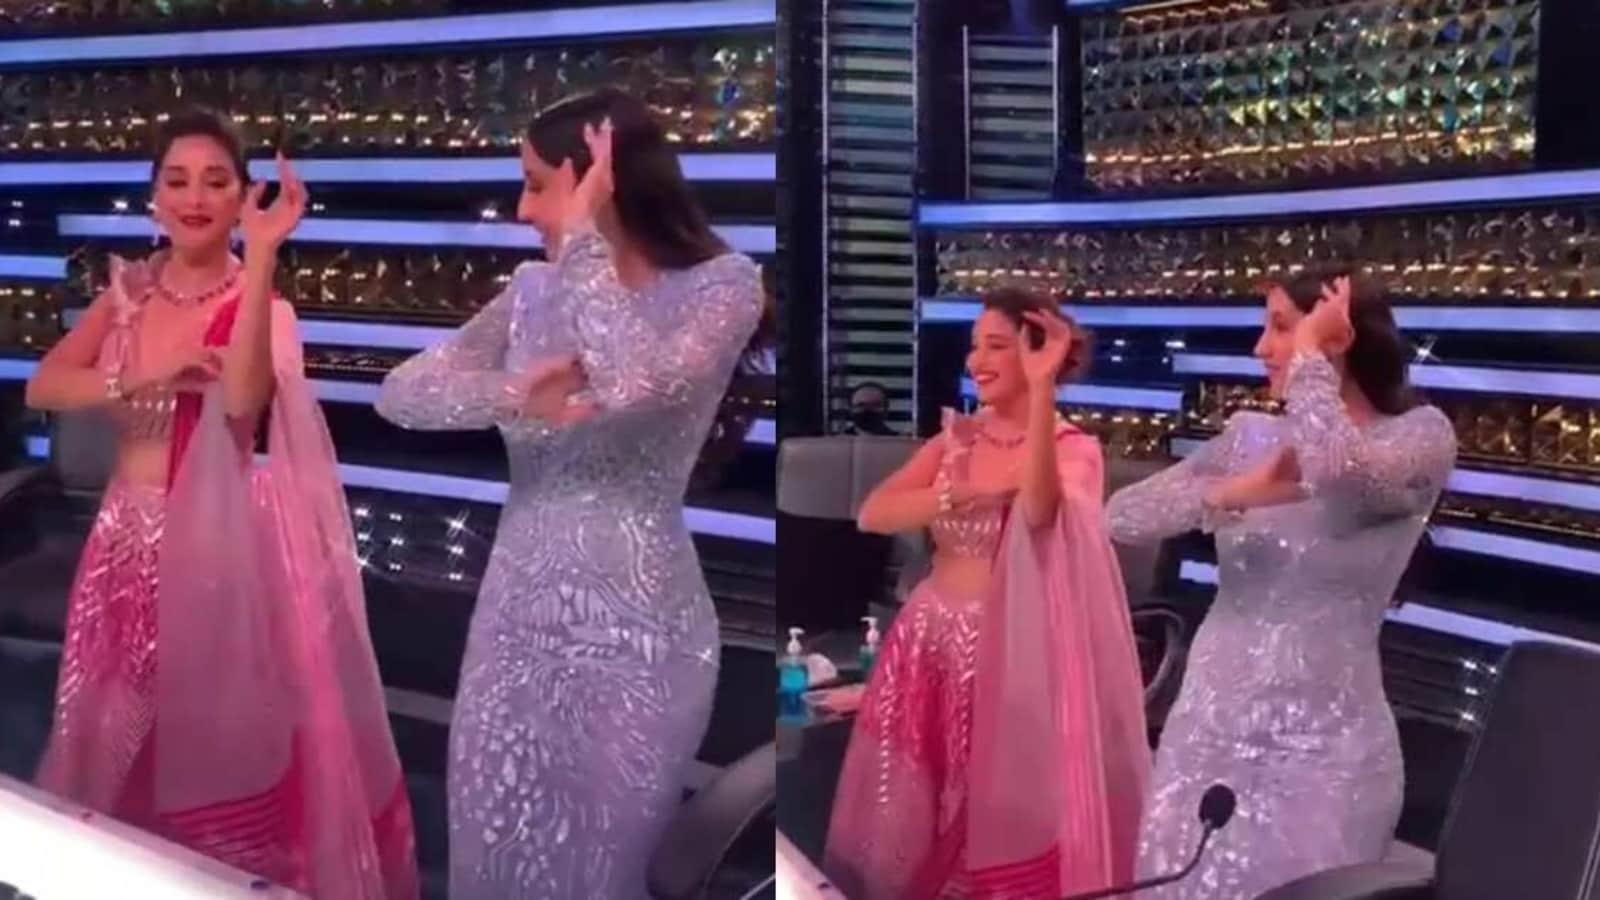 Watch Madhuri Dixit learn Dilbar's hook step from Nora Fatehi on Dance Deewane - Hindustan Times